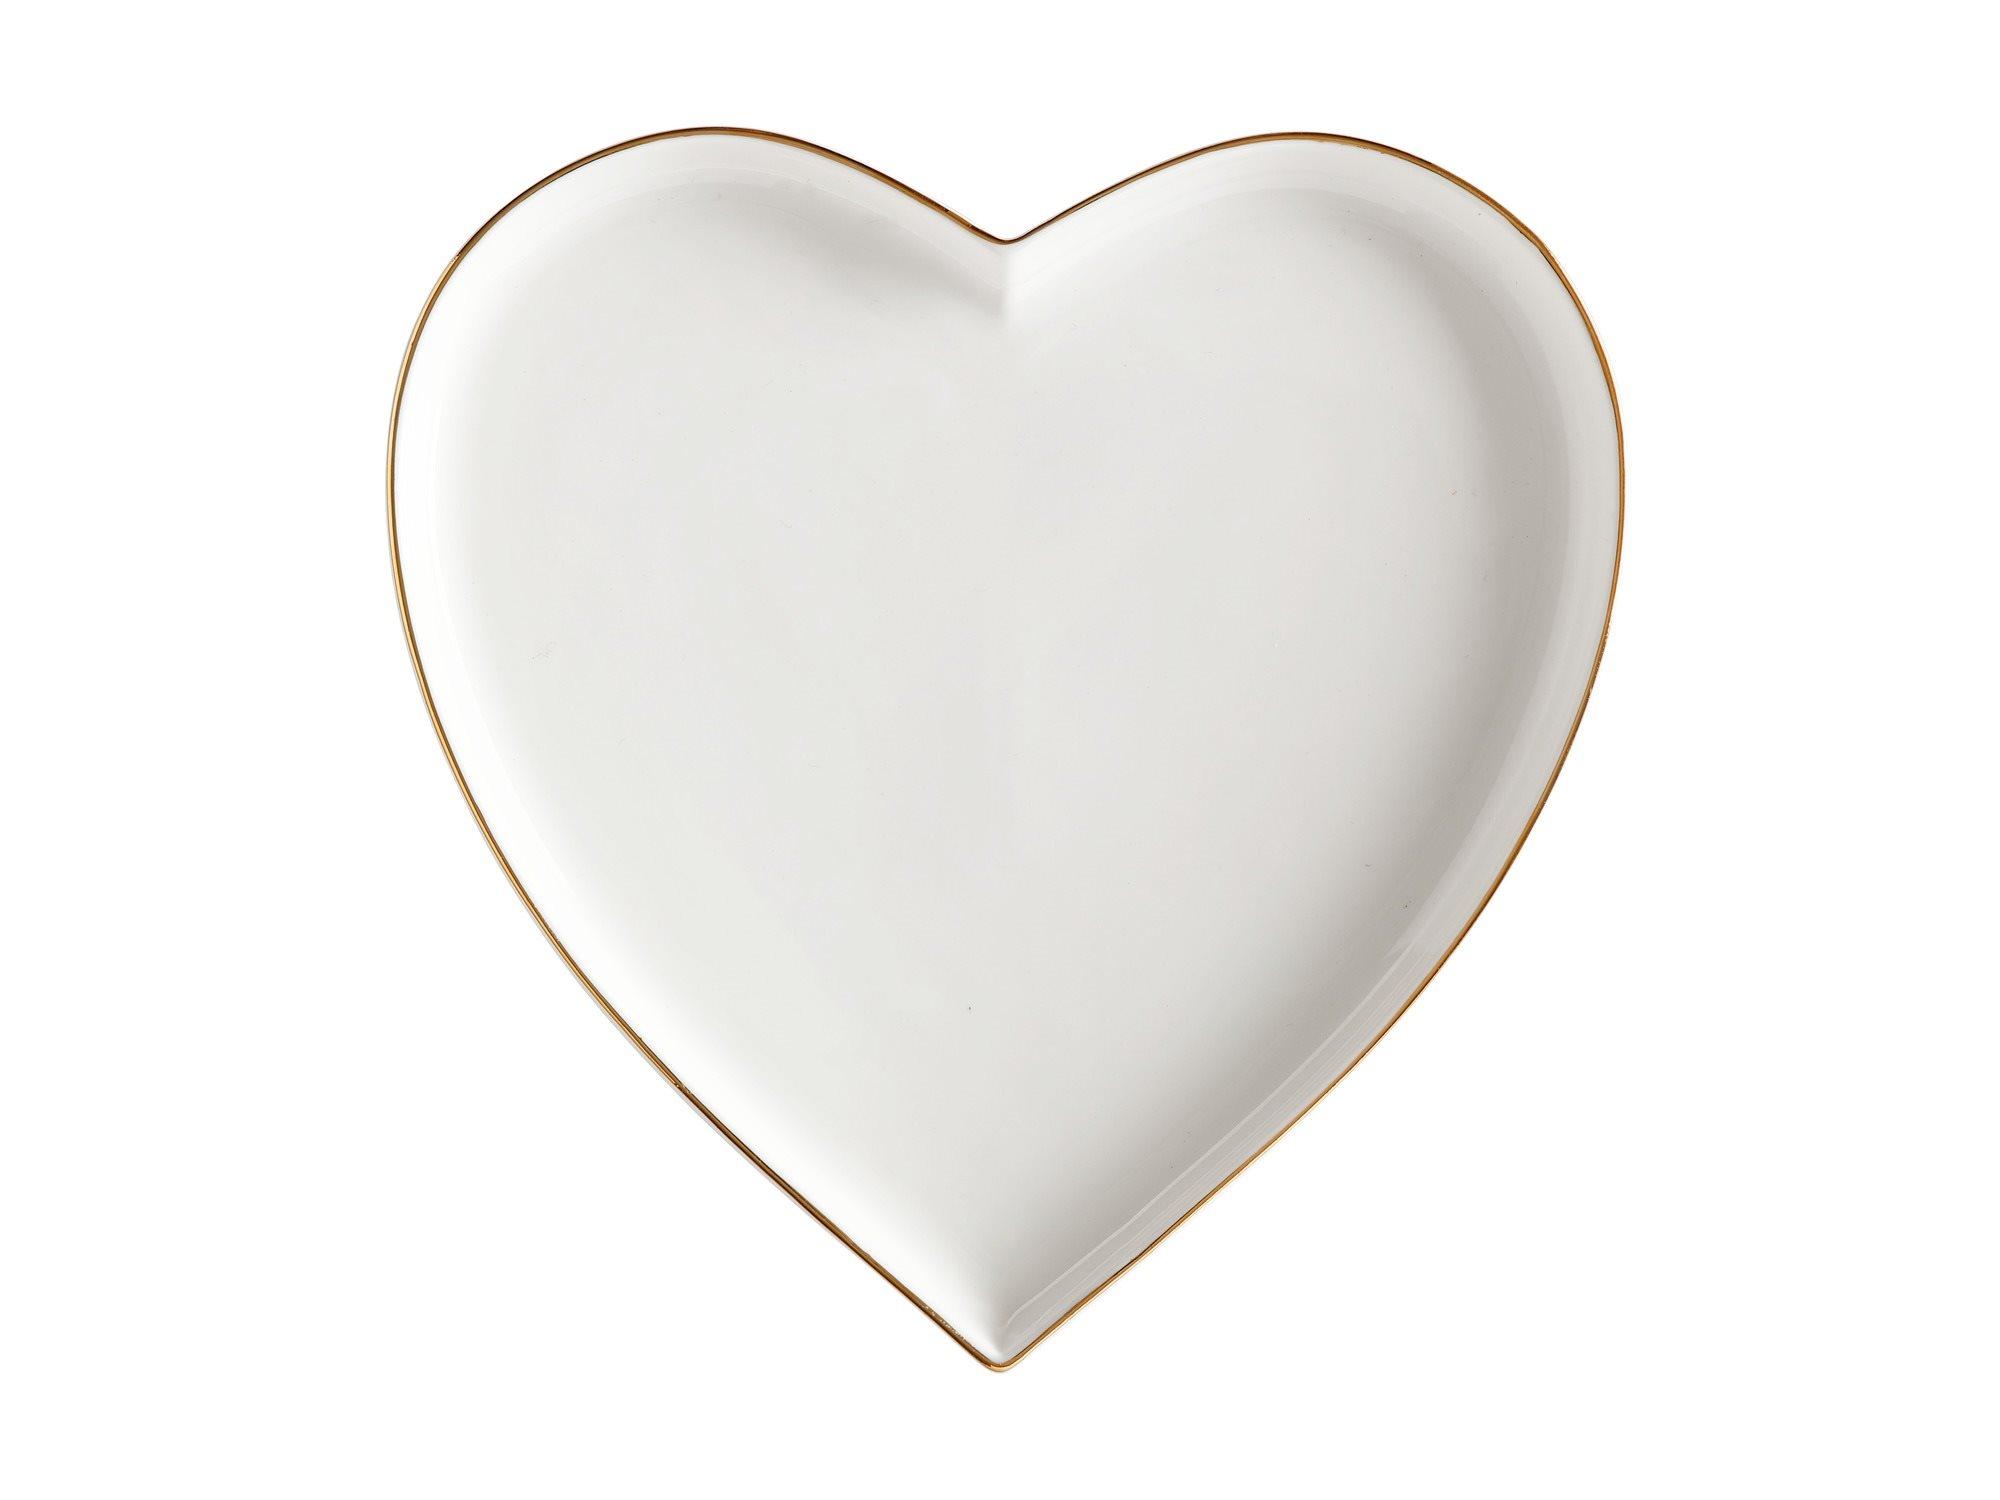 Maxwell & Williams Πιατέλα Καρδιά Λευκή Oro 22cm